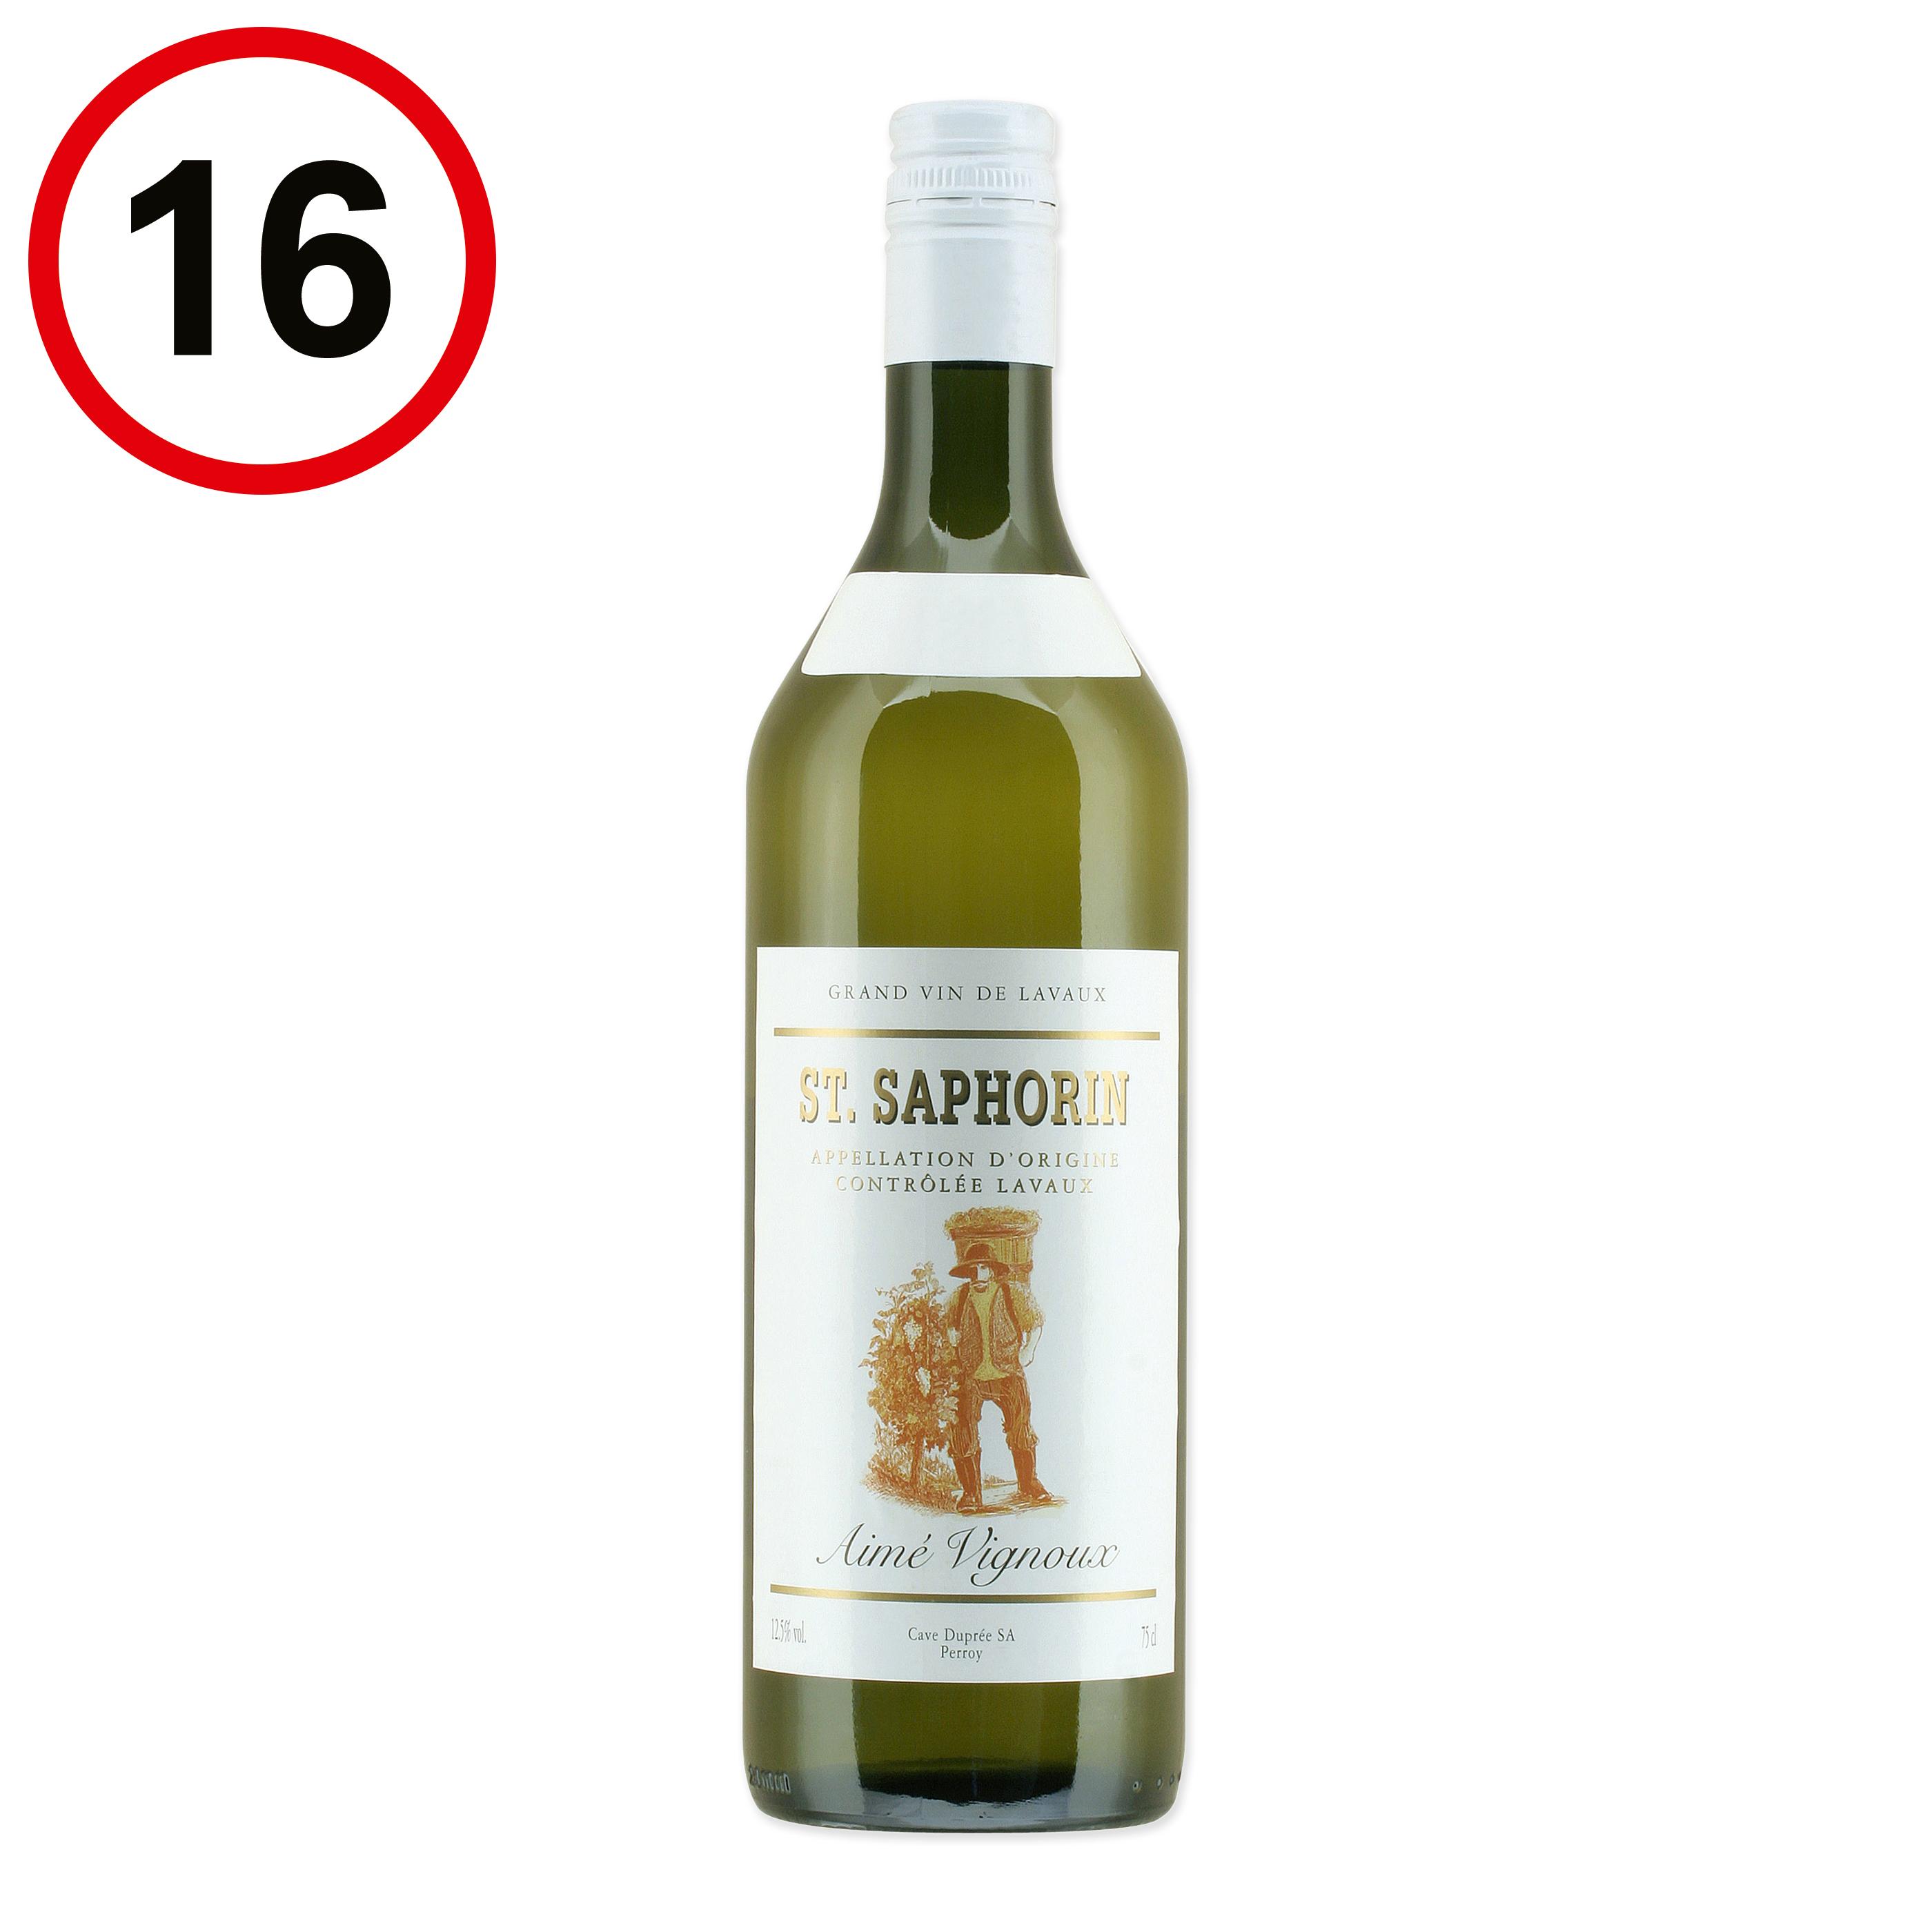 St. Savorin AOC, white wine